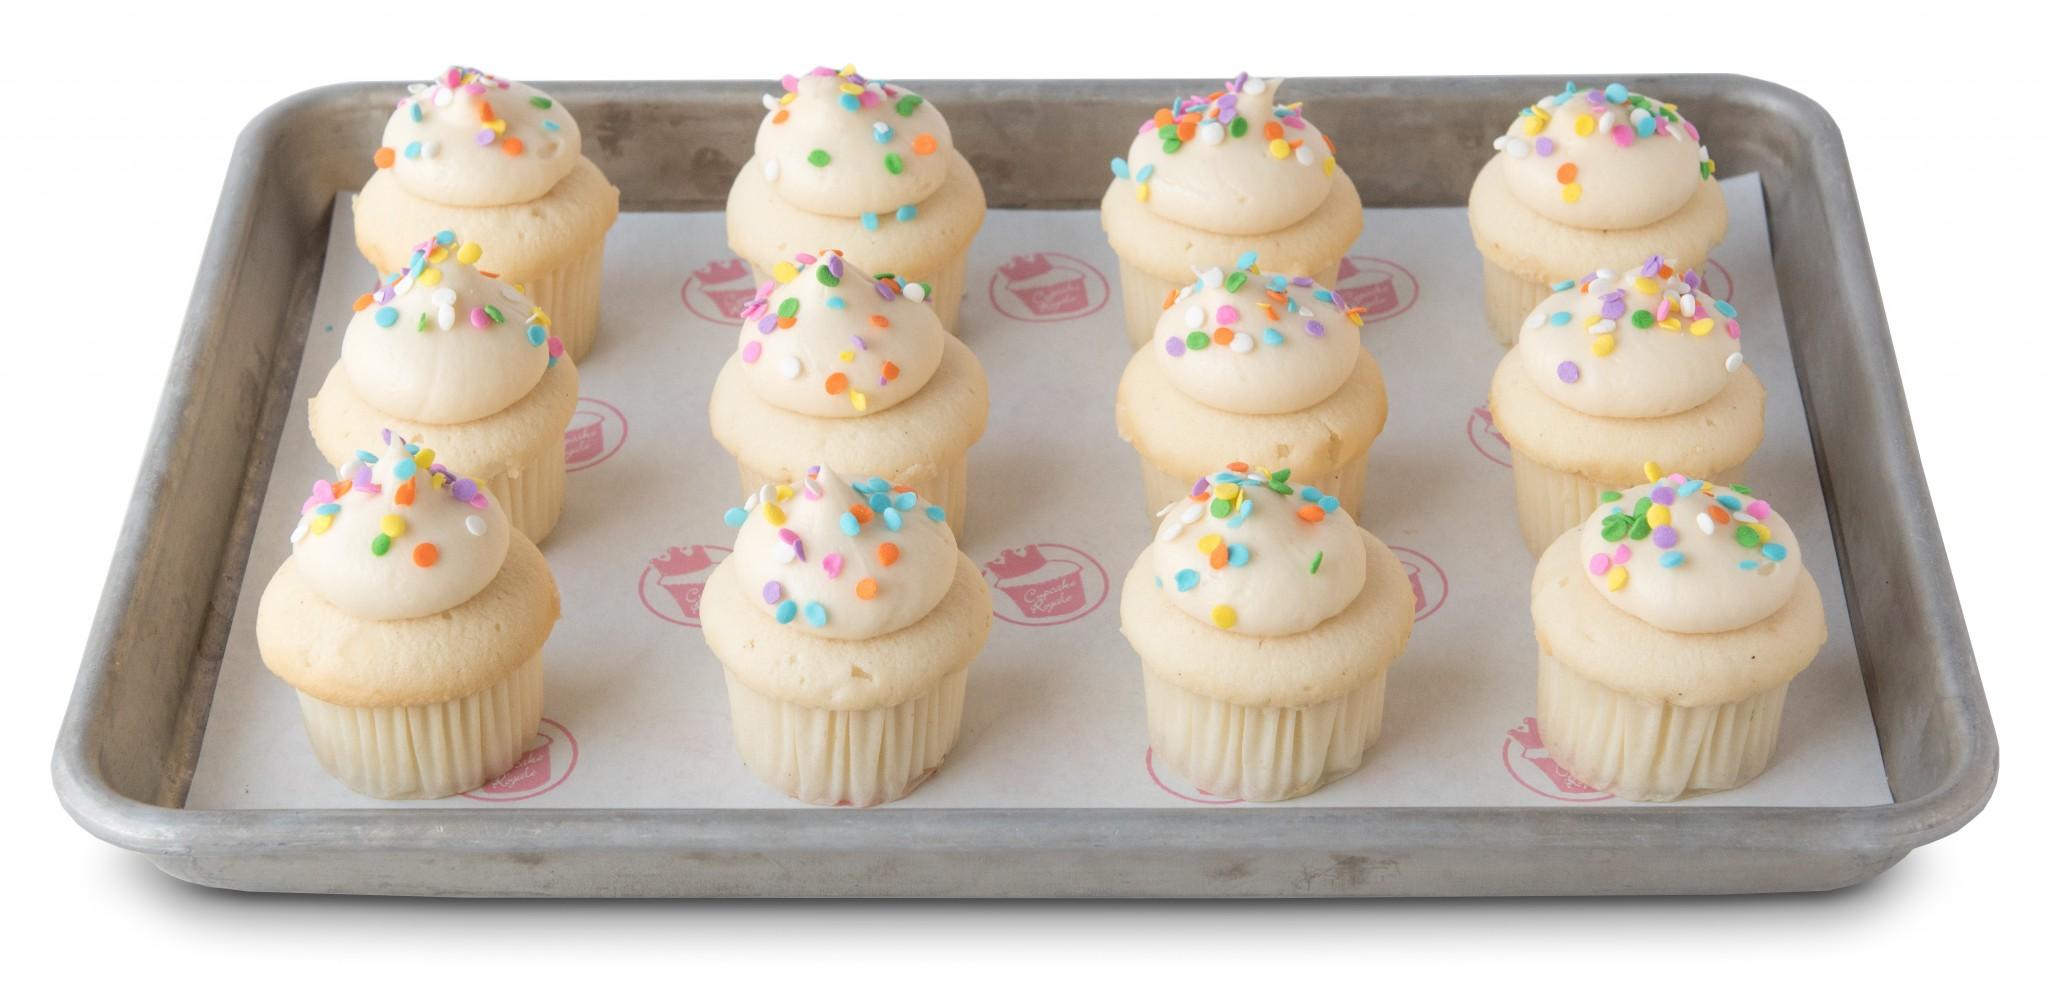 Babycake Flavors Seattle S Best Cupcakes